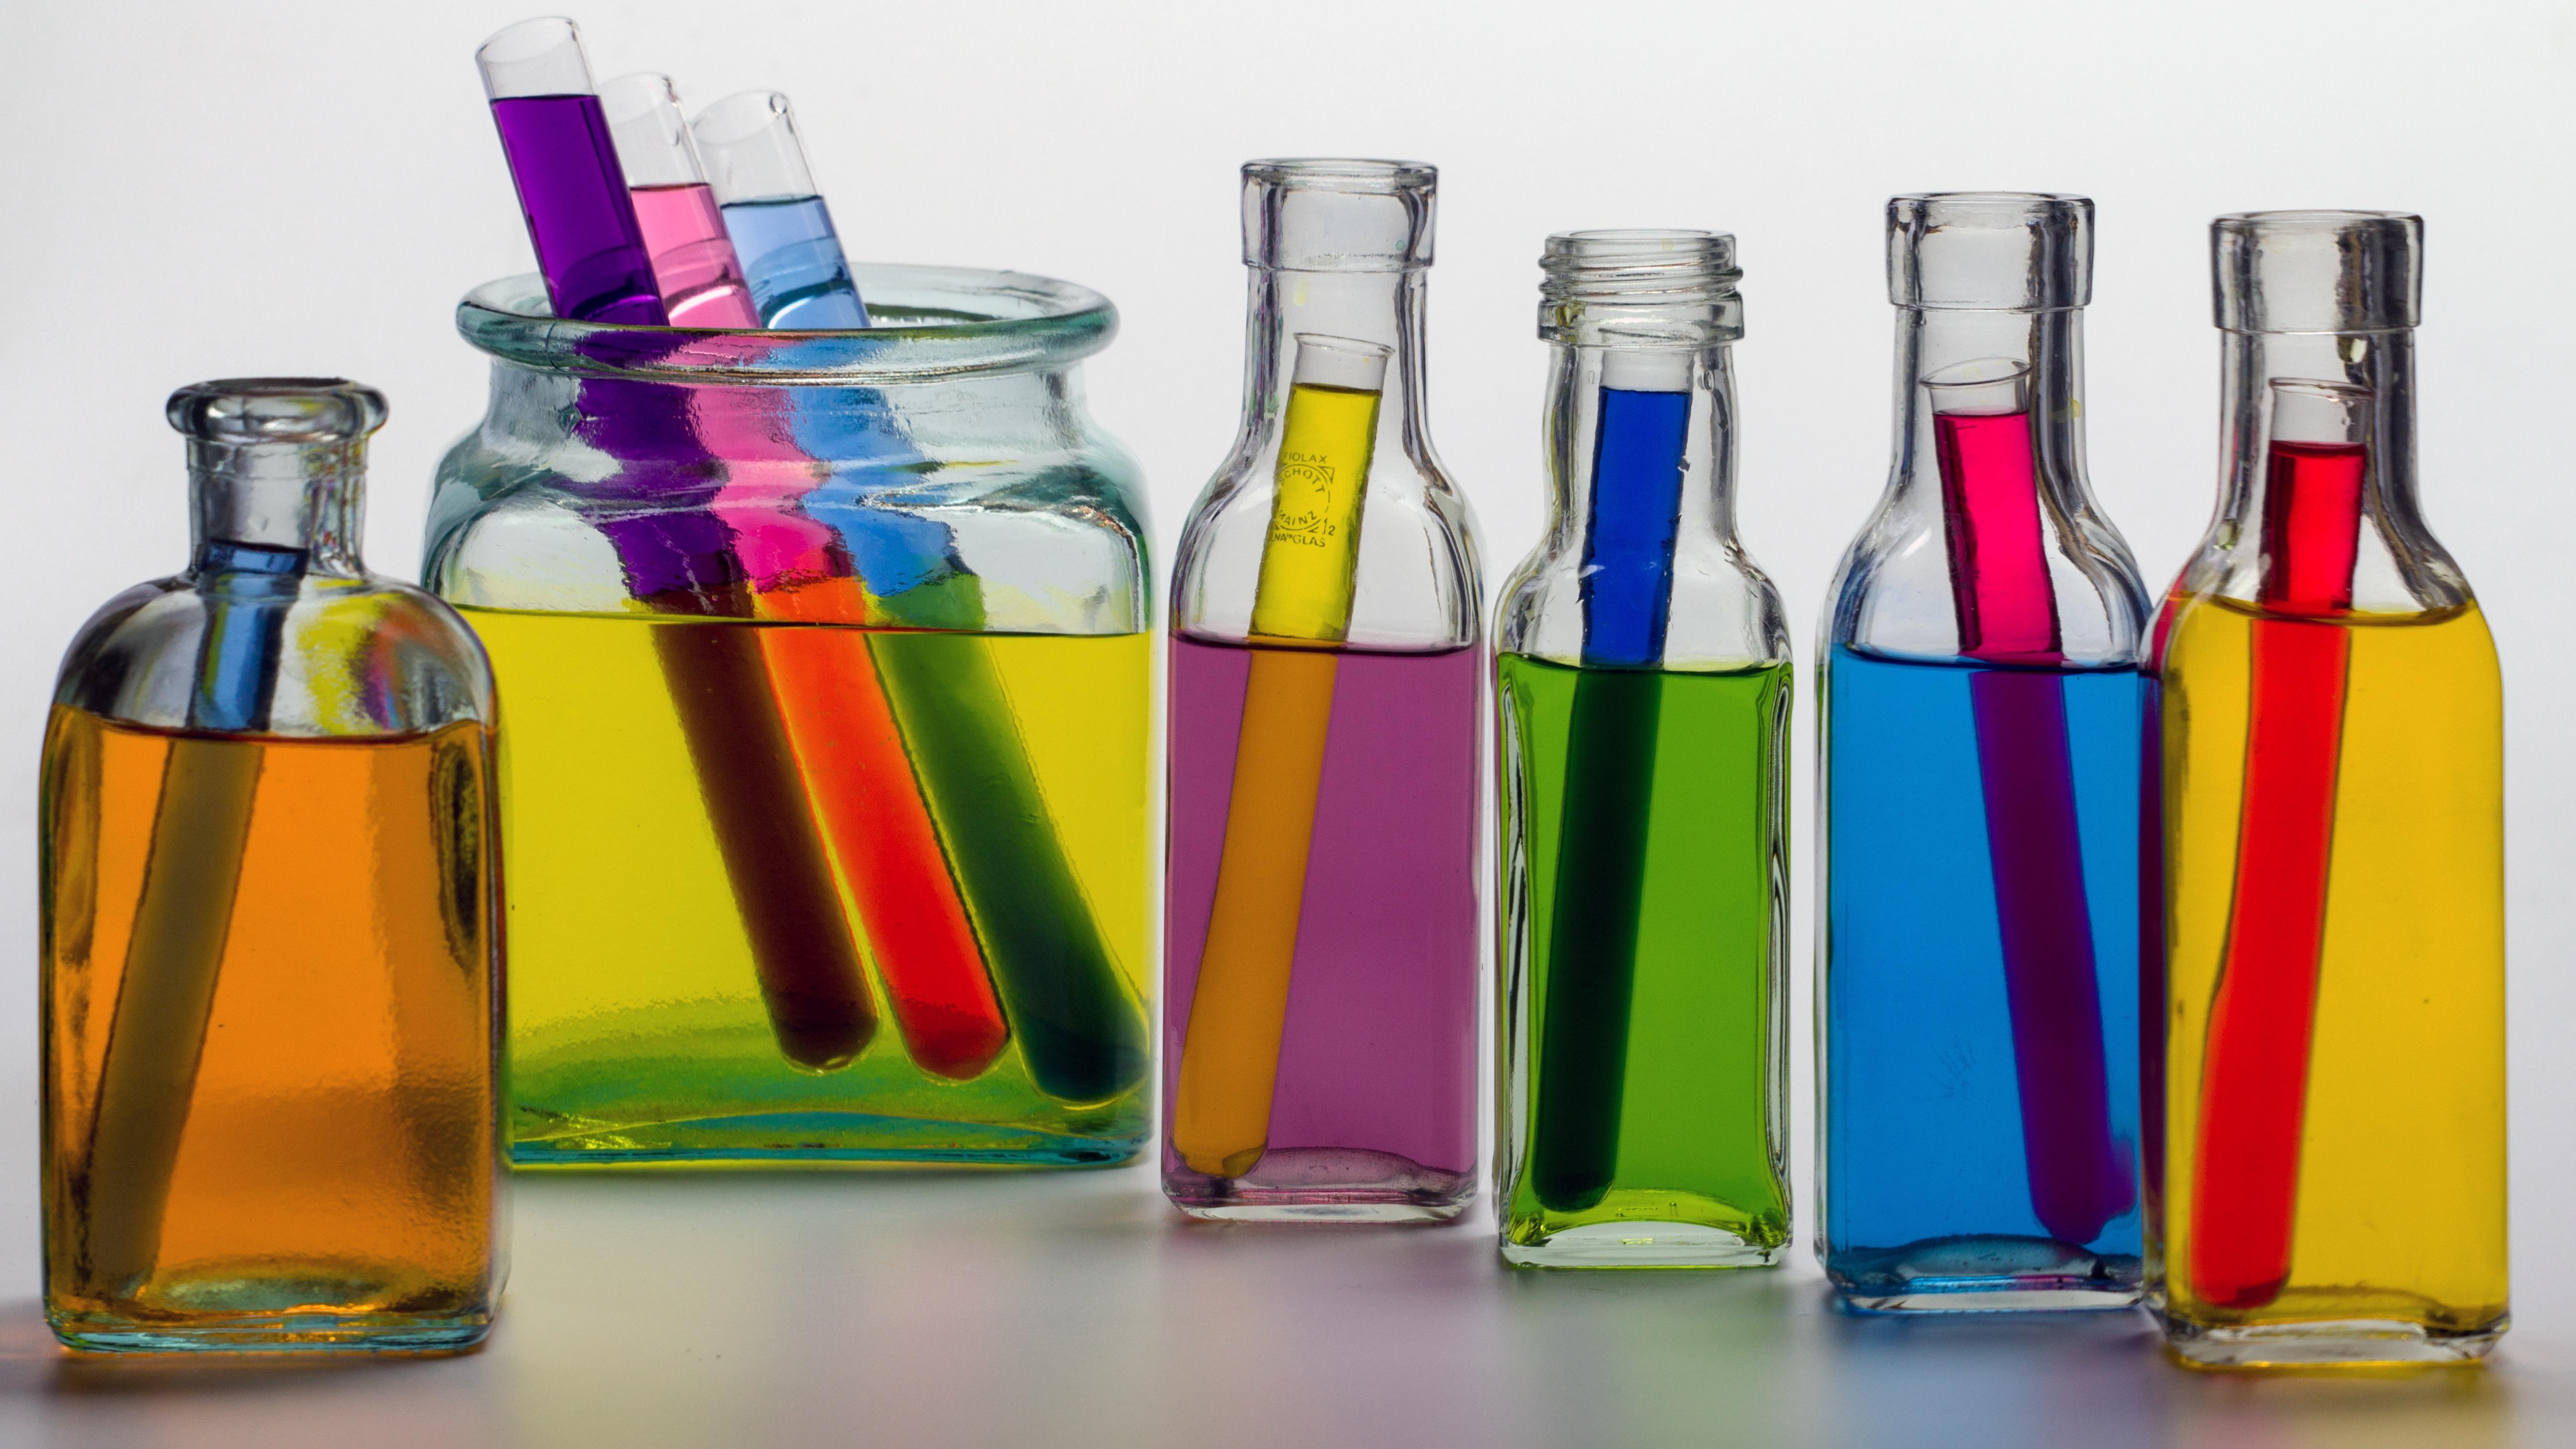 Free Images : color, still life, tableware, wine bottle, glass ...